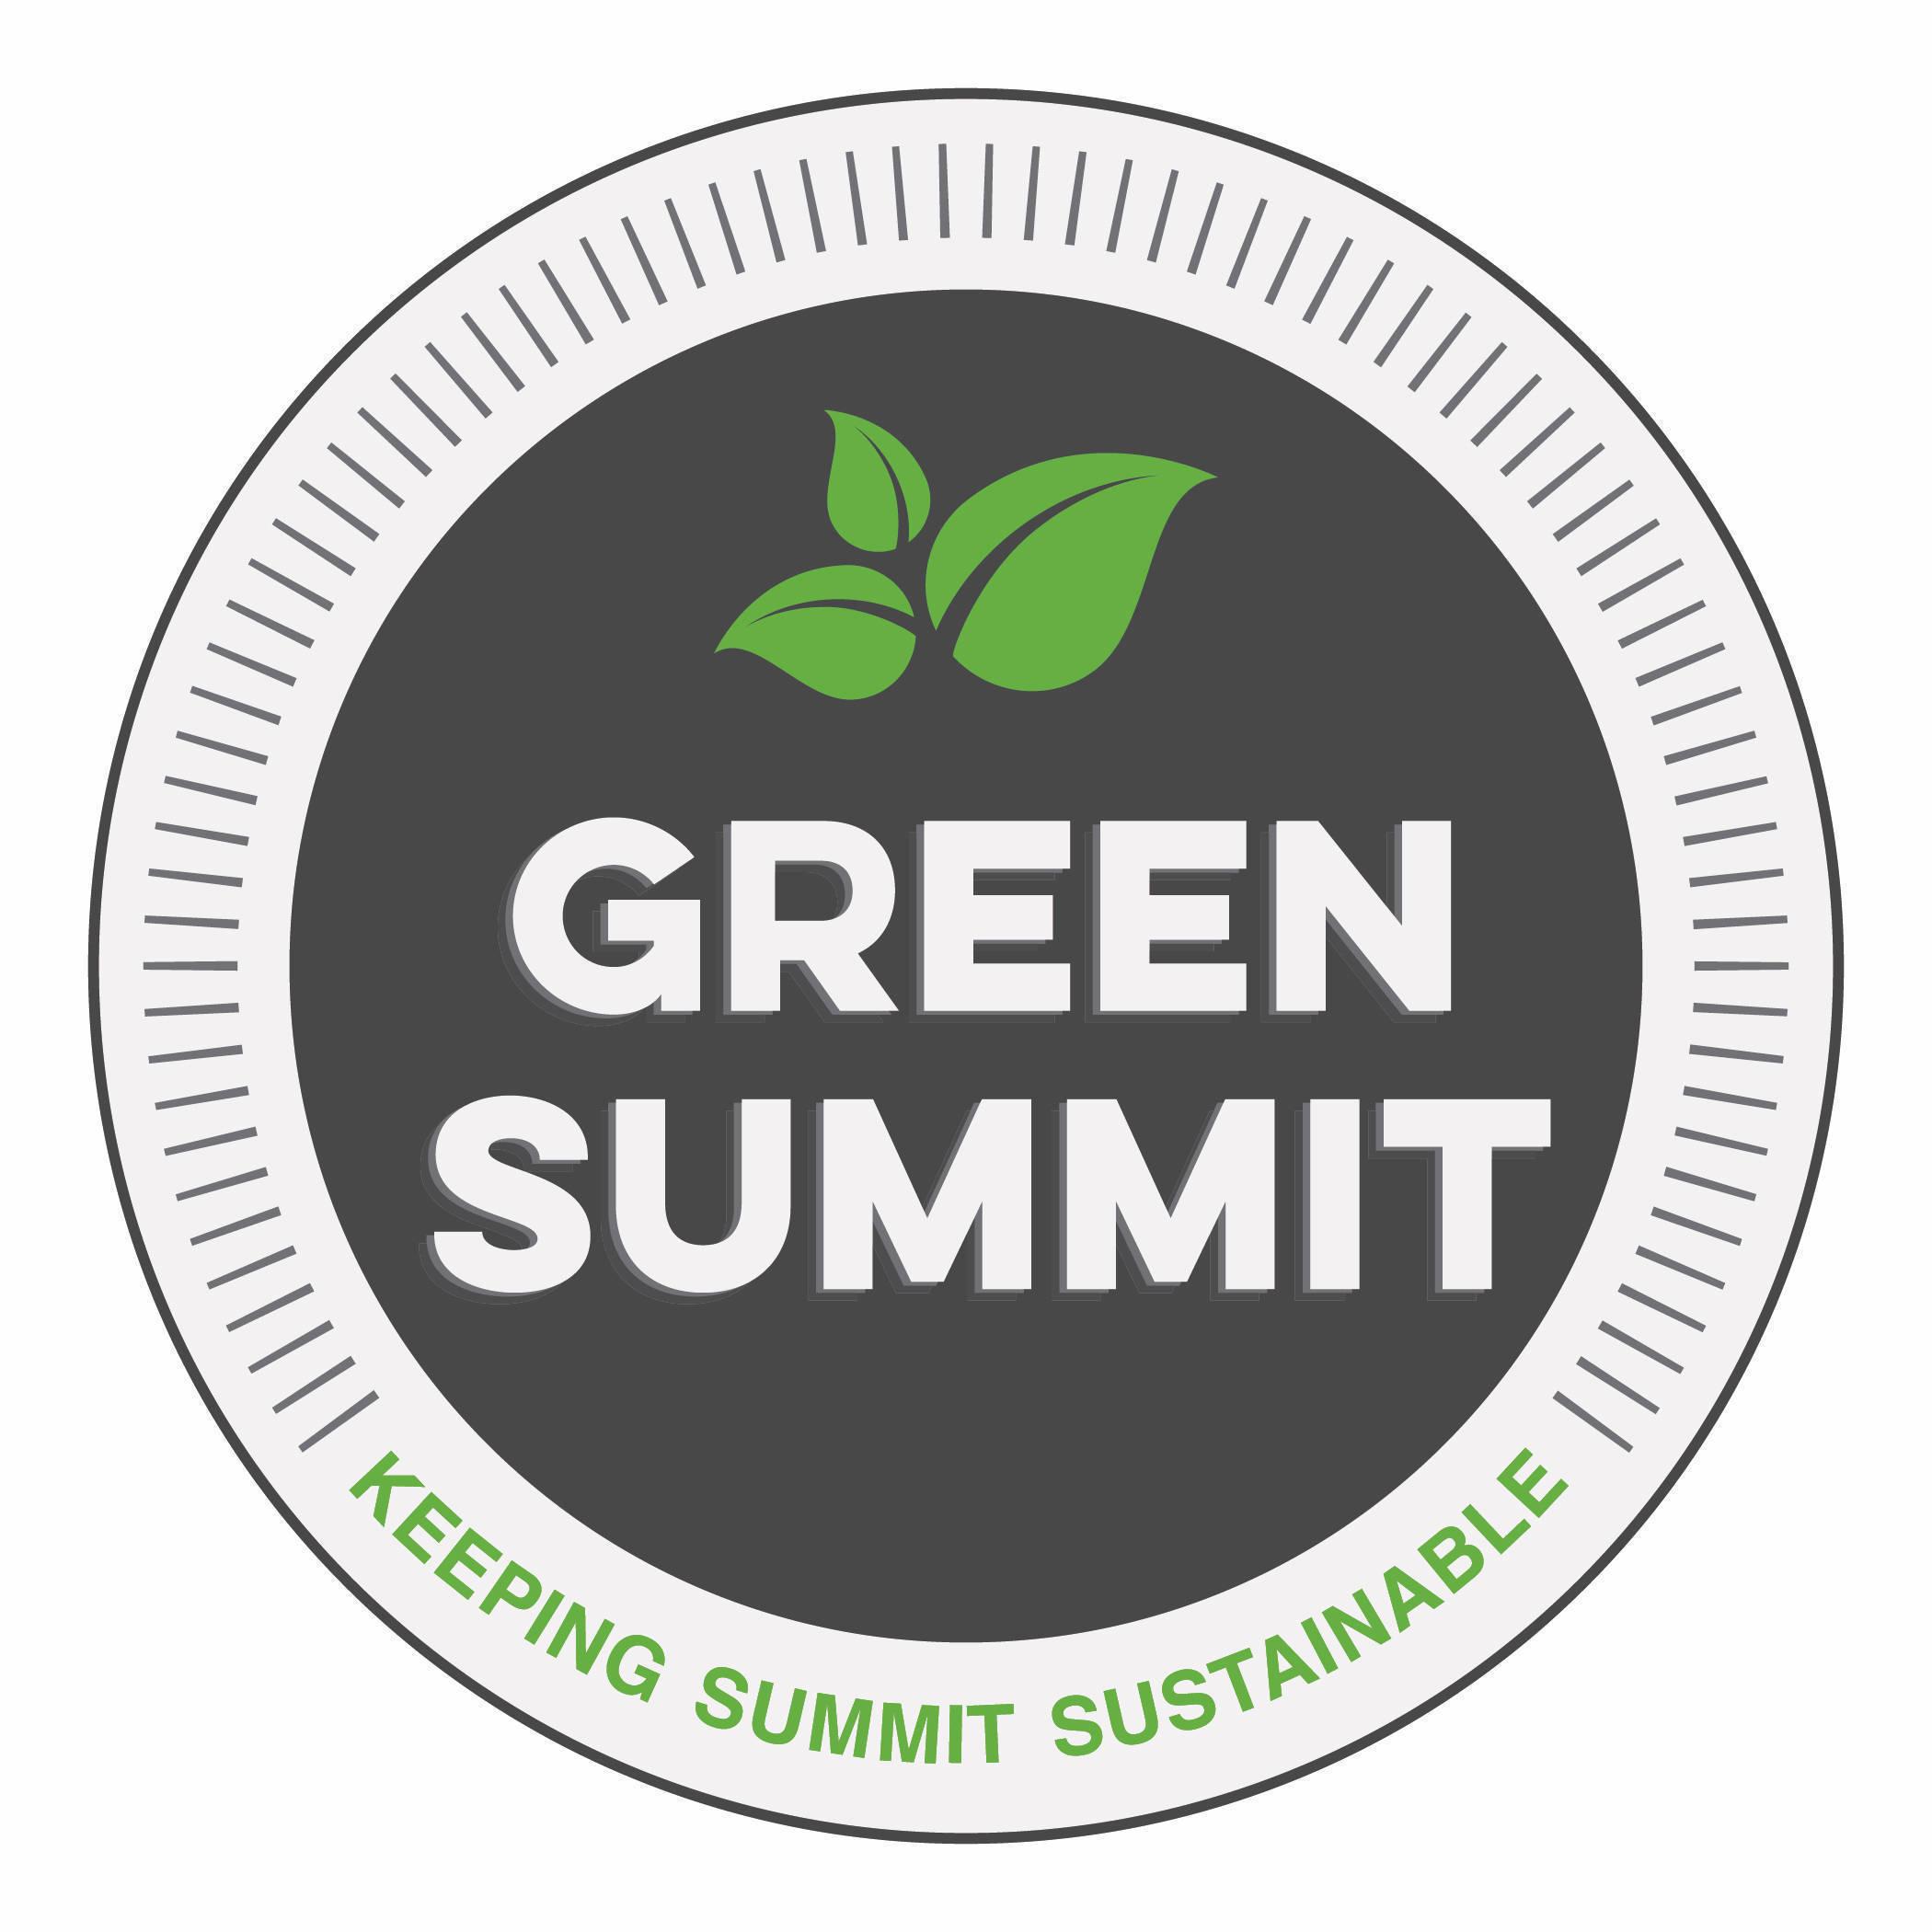 67d6254c764b6522813f_9e642ac884ce67a859f6_Green_Summit-Logo.jpg